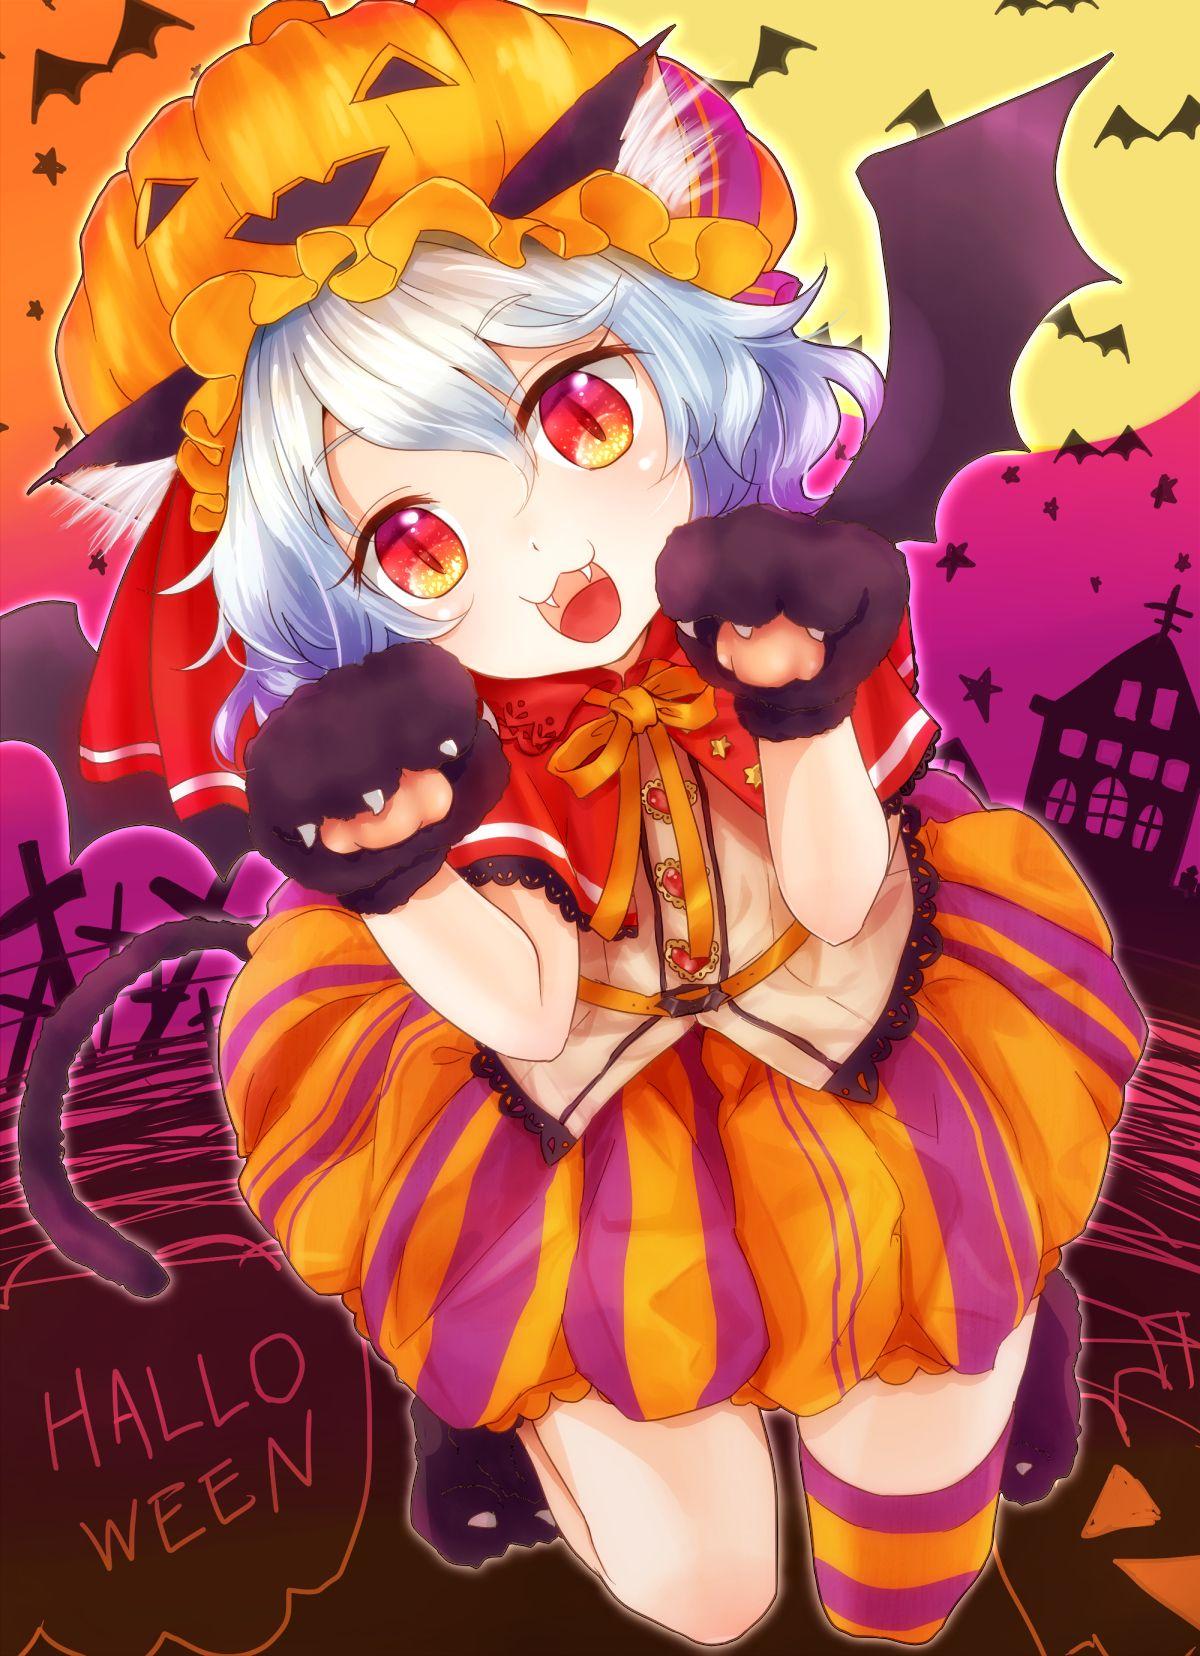 Image result for sexy anime neko girl halloween